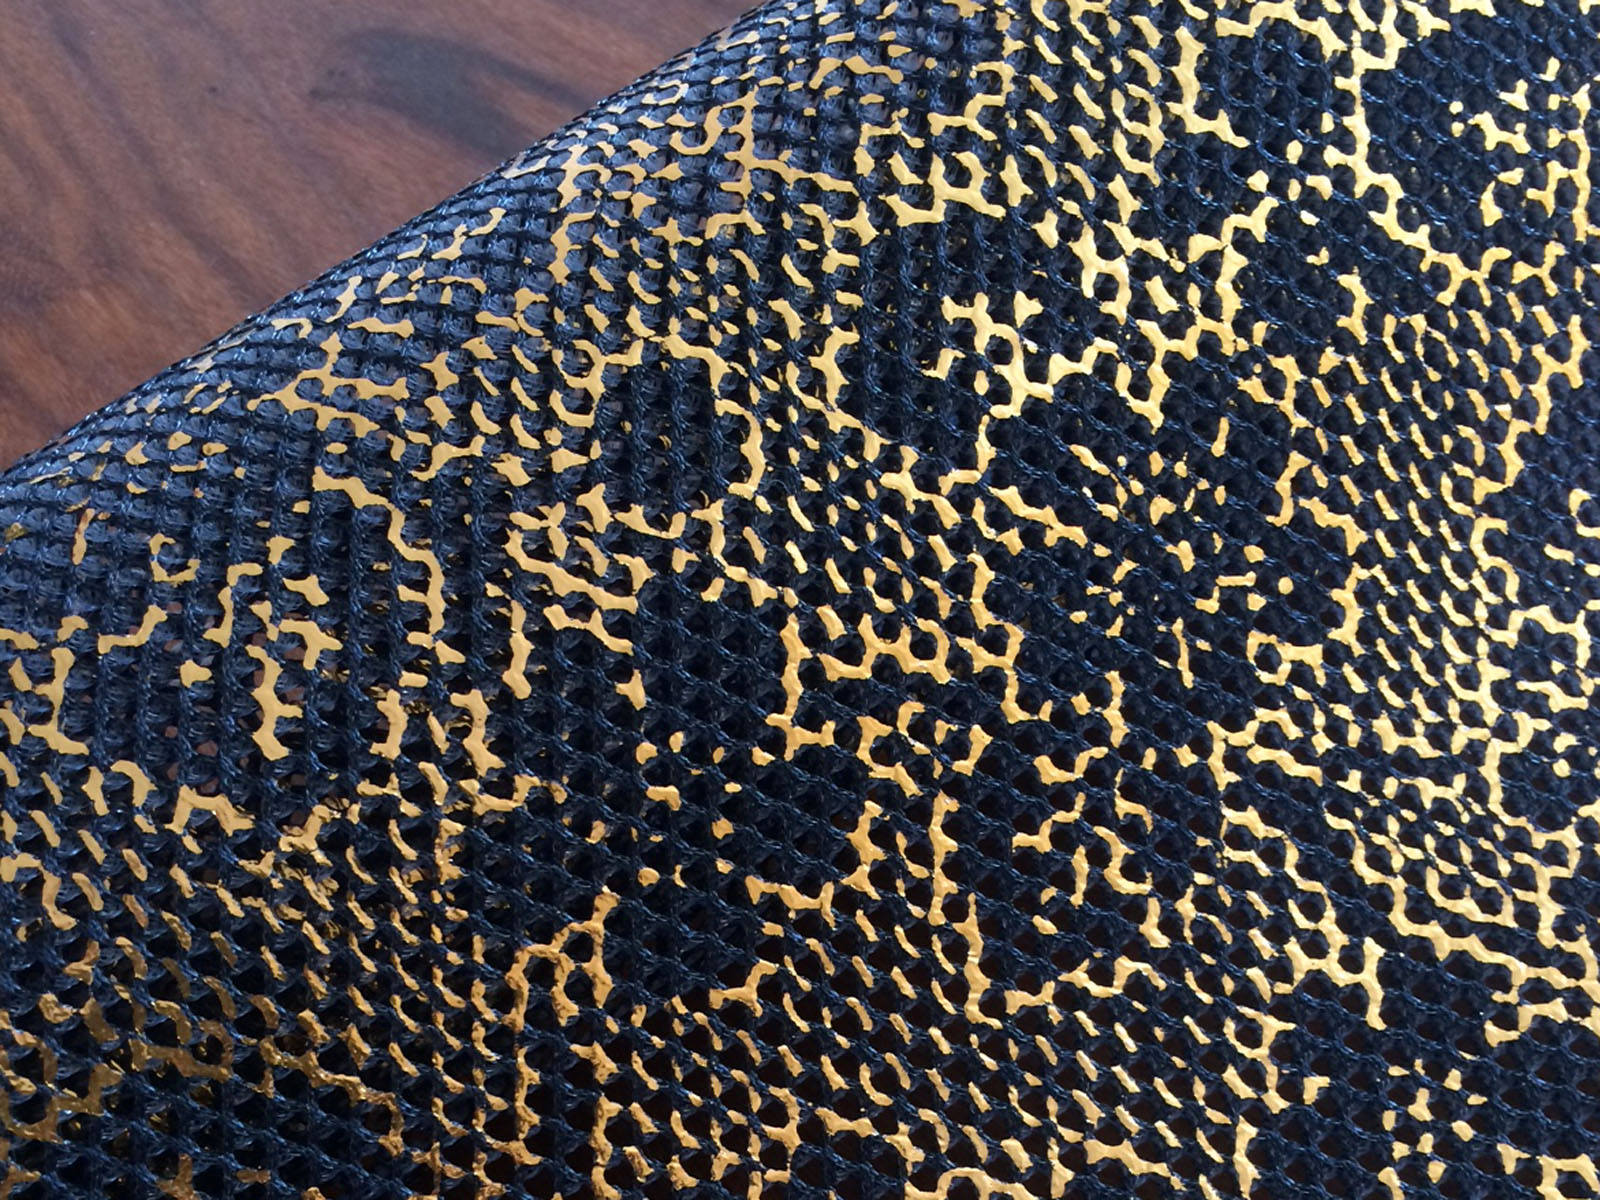 Metallics on technical knits